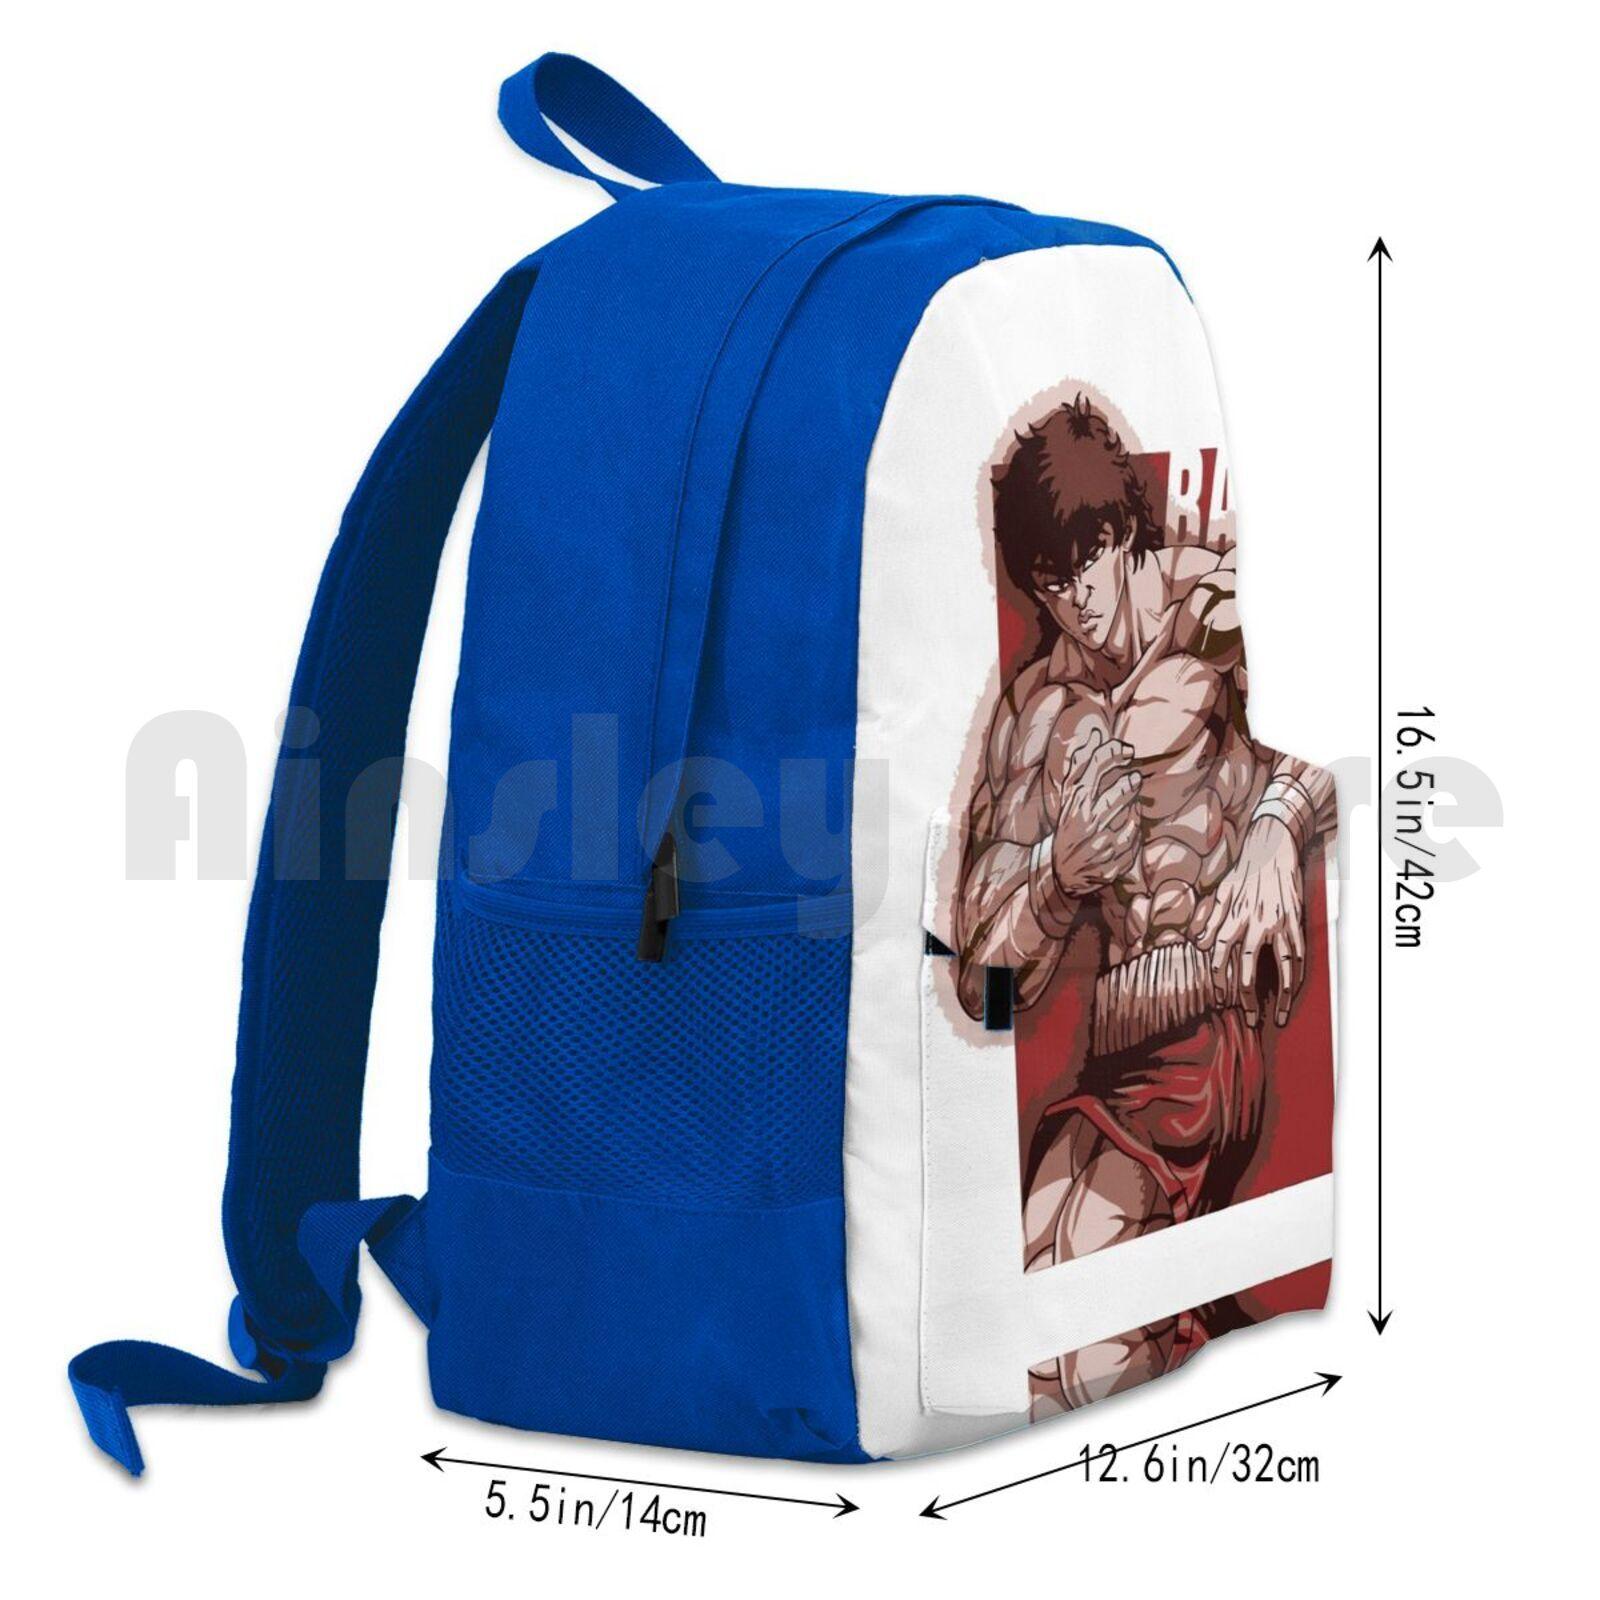 H6b54e29245404a3cb75e7867d3cb307dC - Anime Backpacks